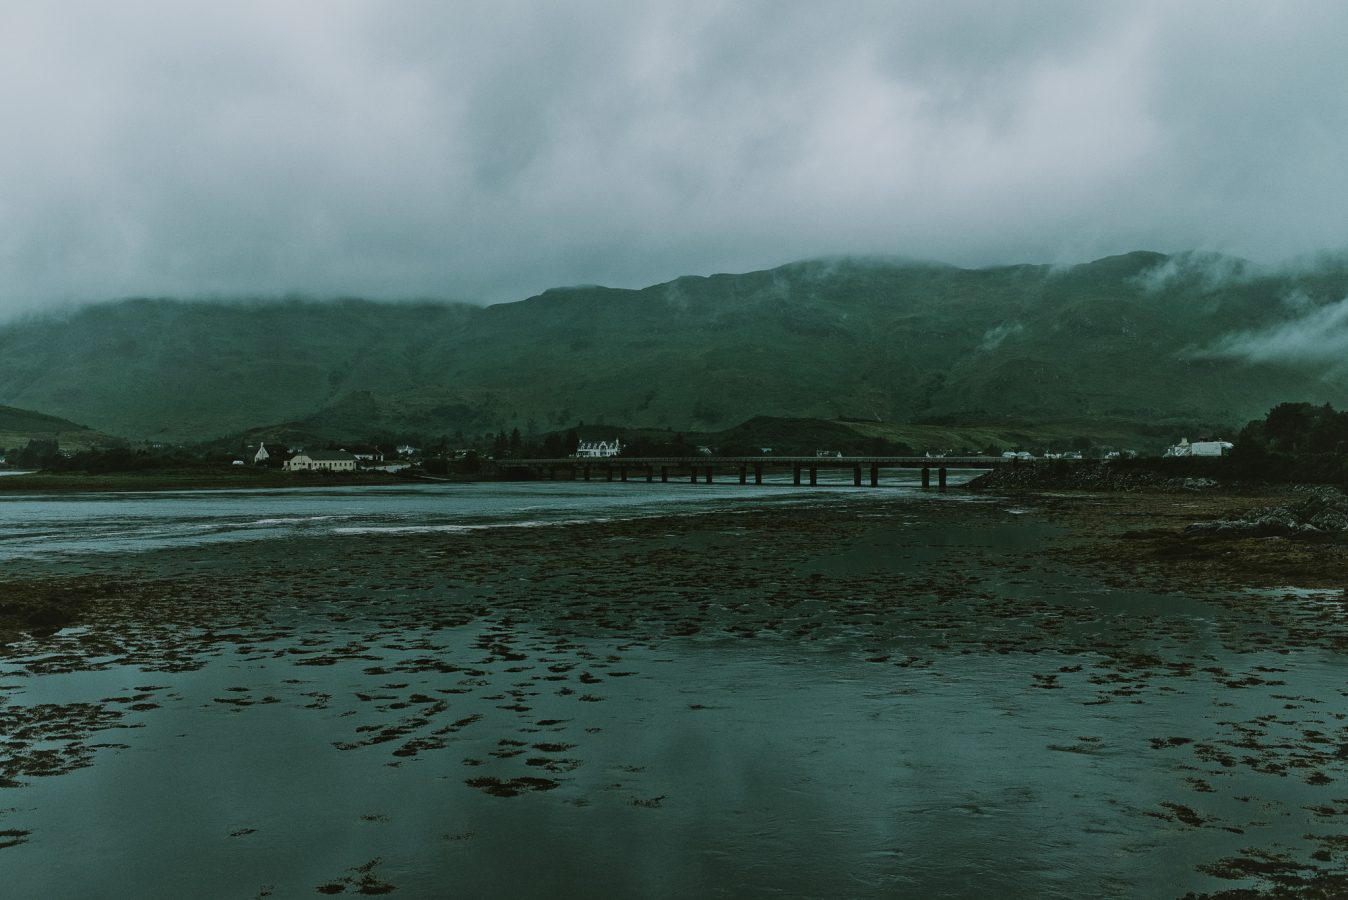 Loch at Isle of Skye